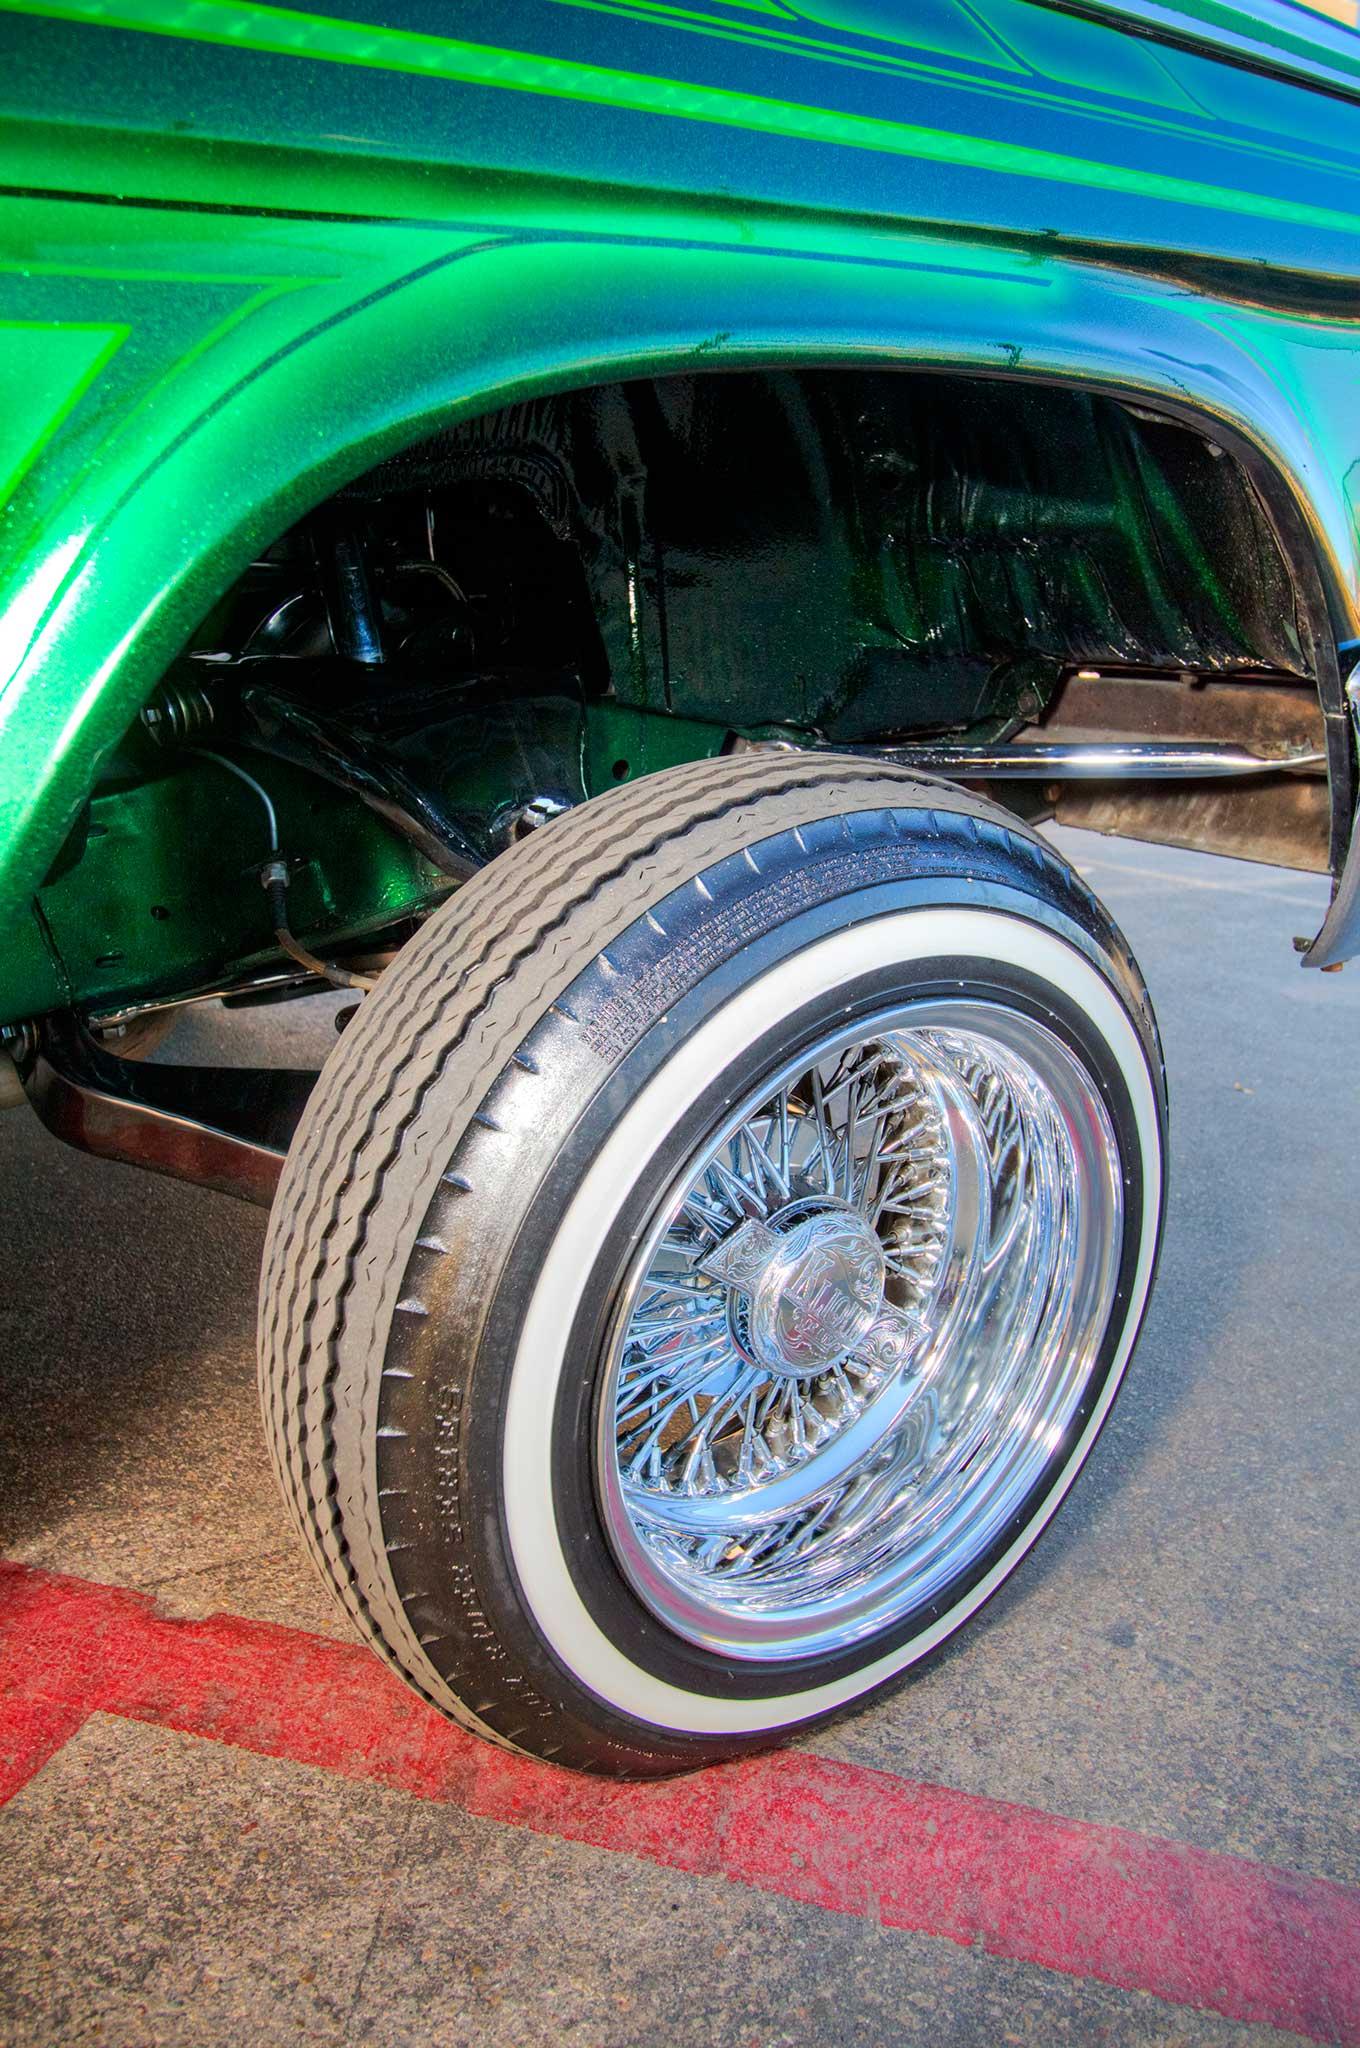 Car Audio System >> Joe Guzman's 1962 Chevy Impala - Lowrider